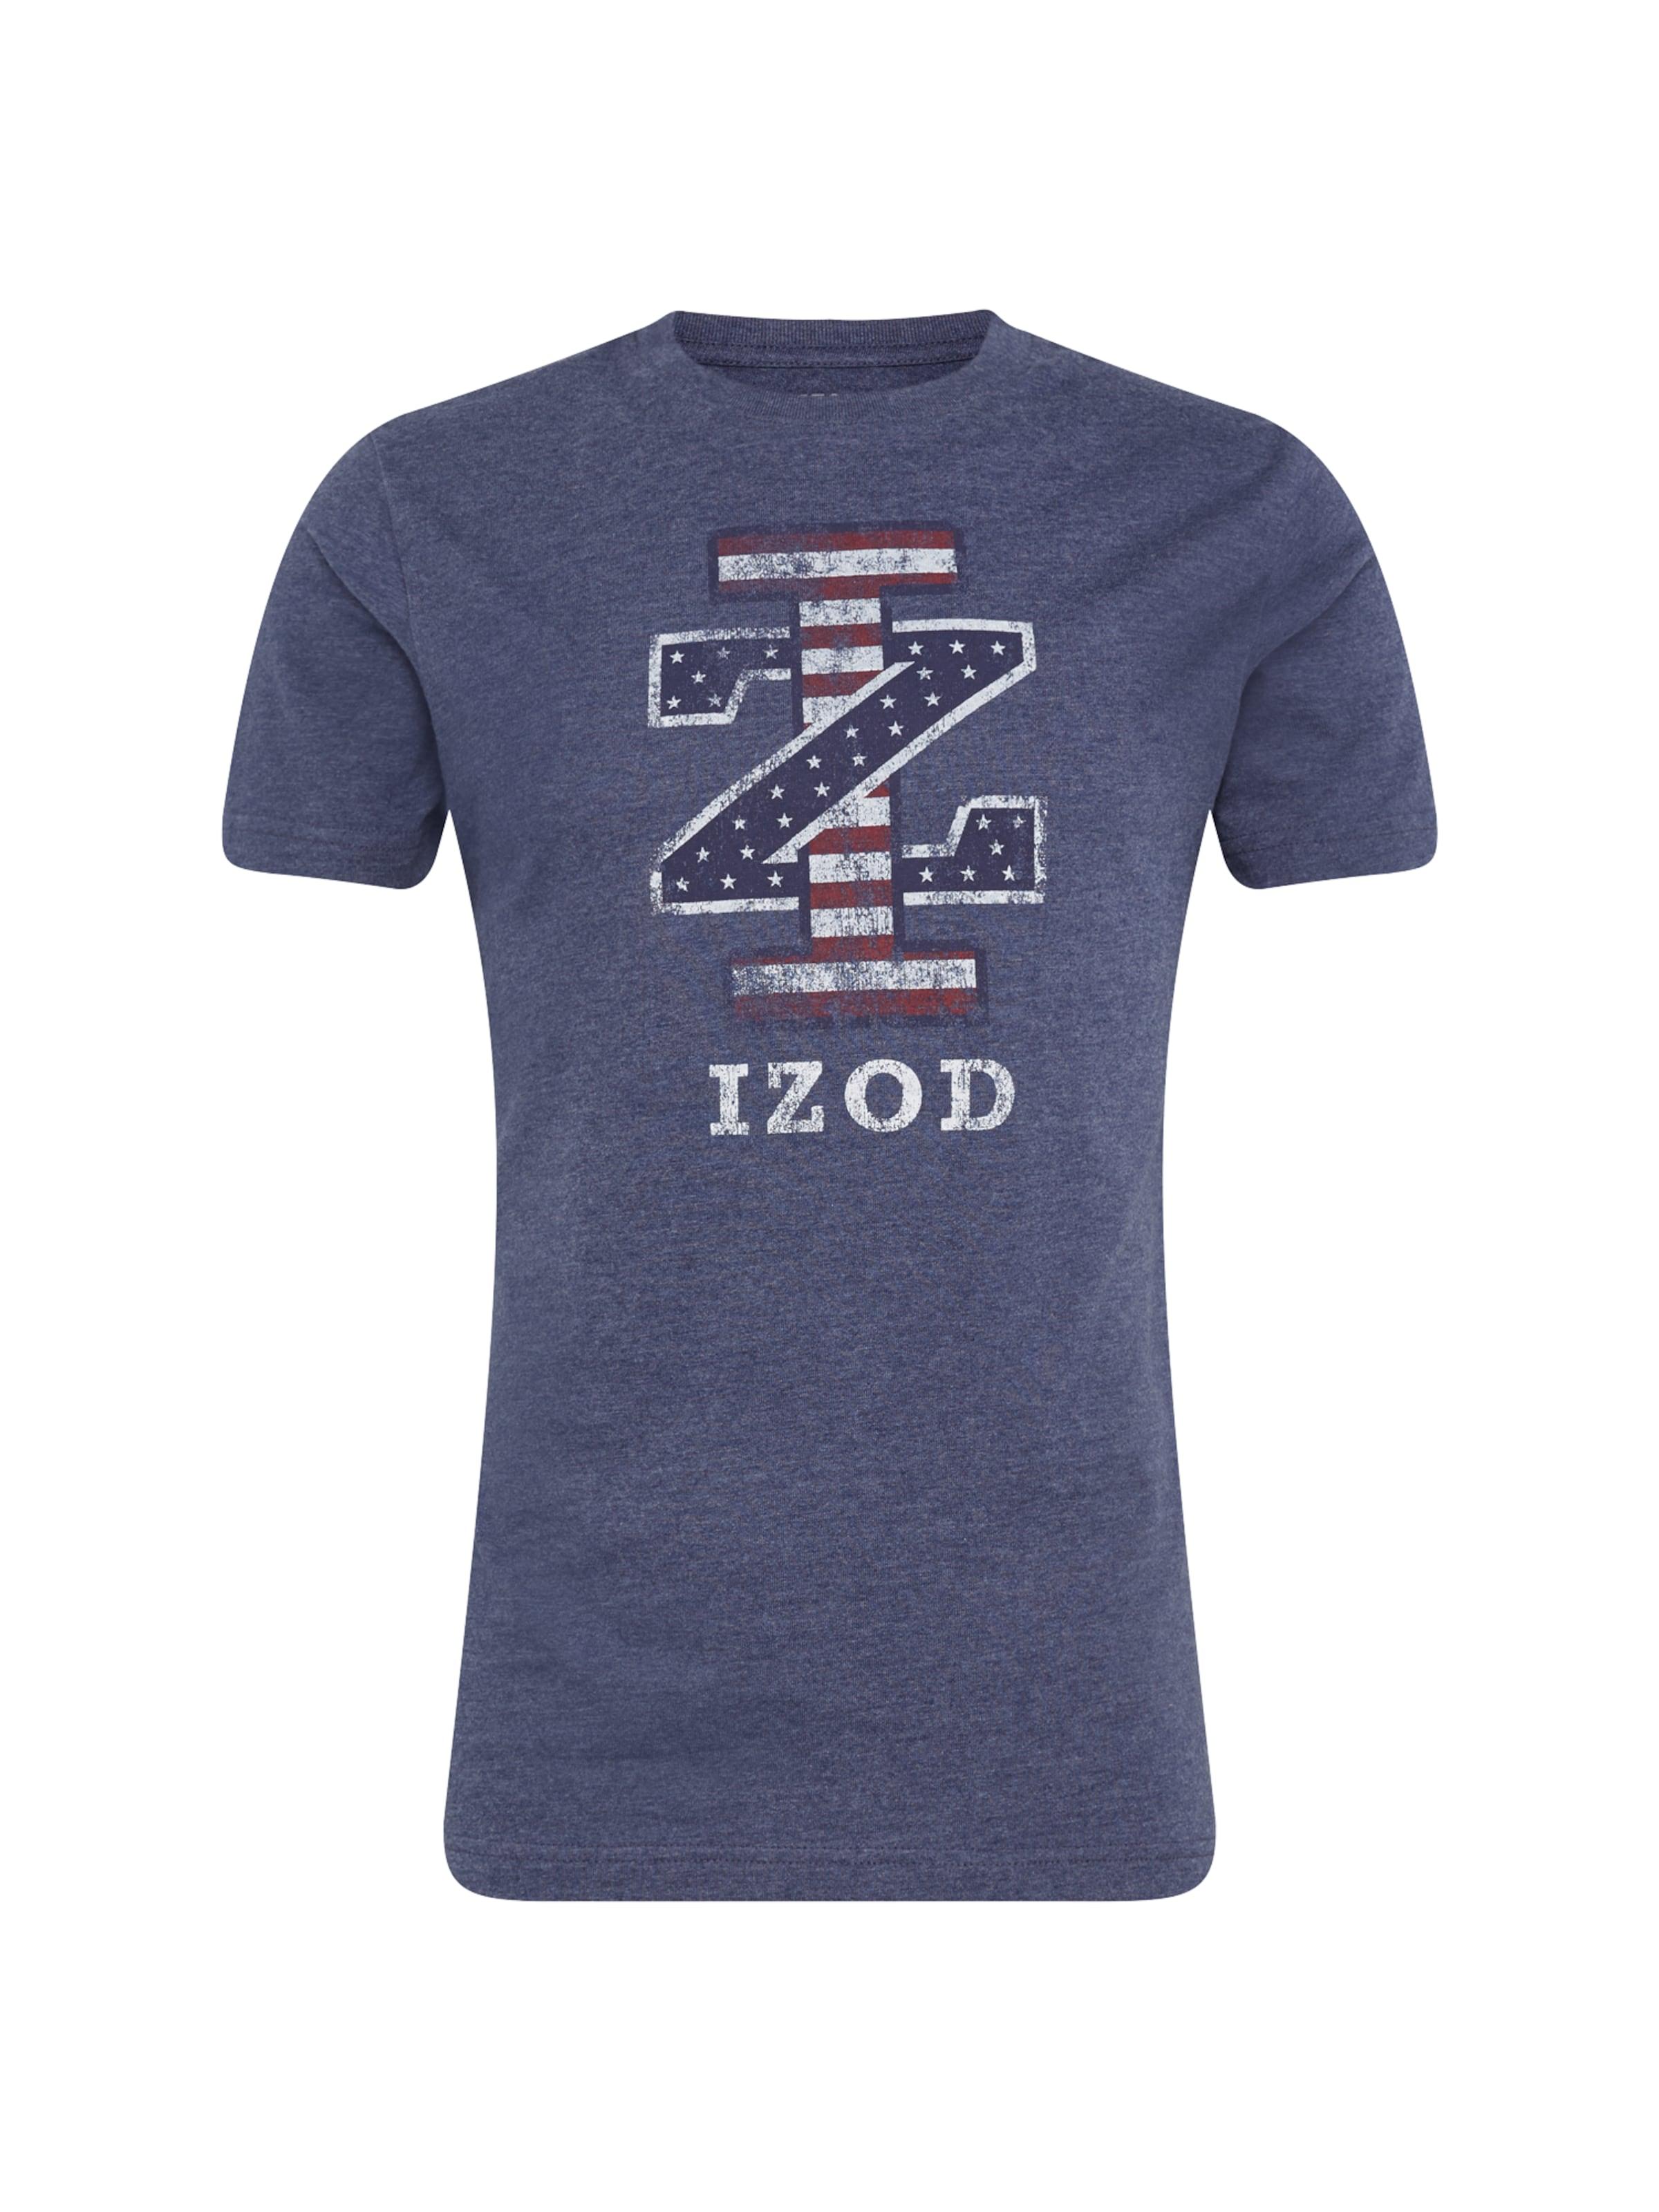 Graphic Bleu Couleurs 'iz De In Tee' FoncéMélange IzodT shirt 6gI7Yfybv